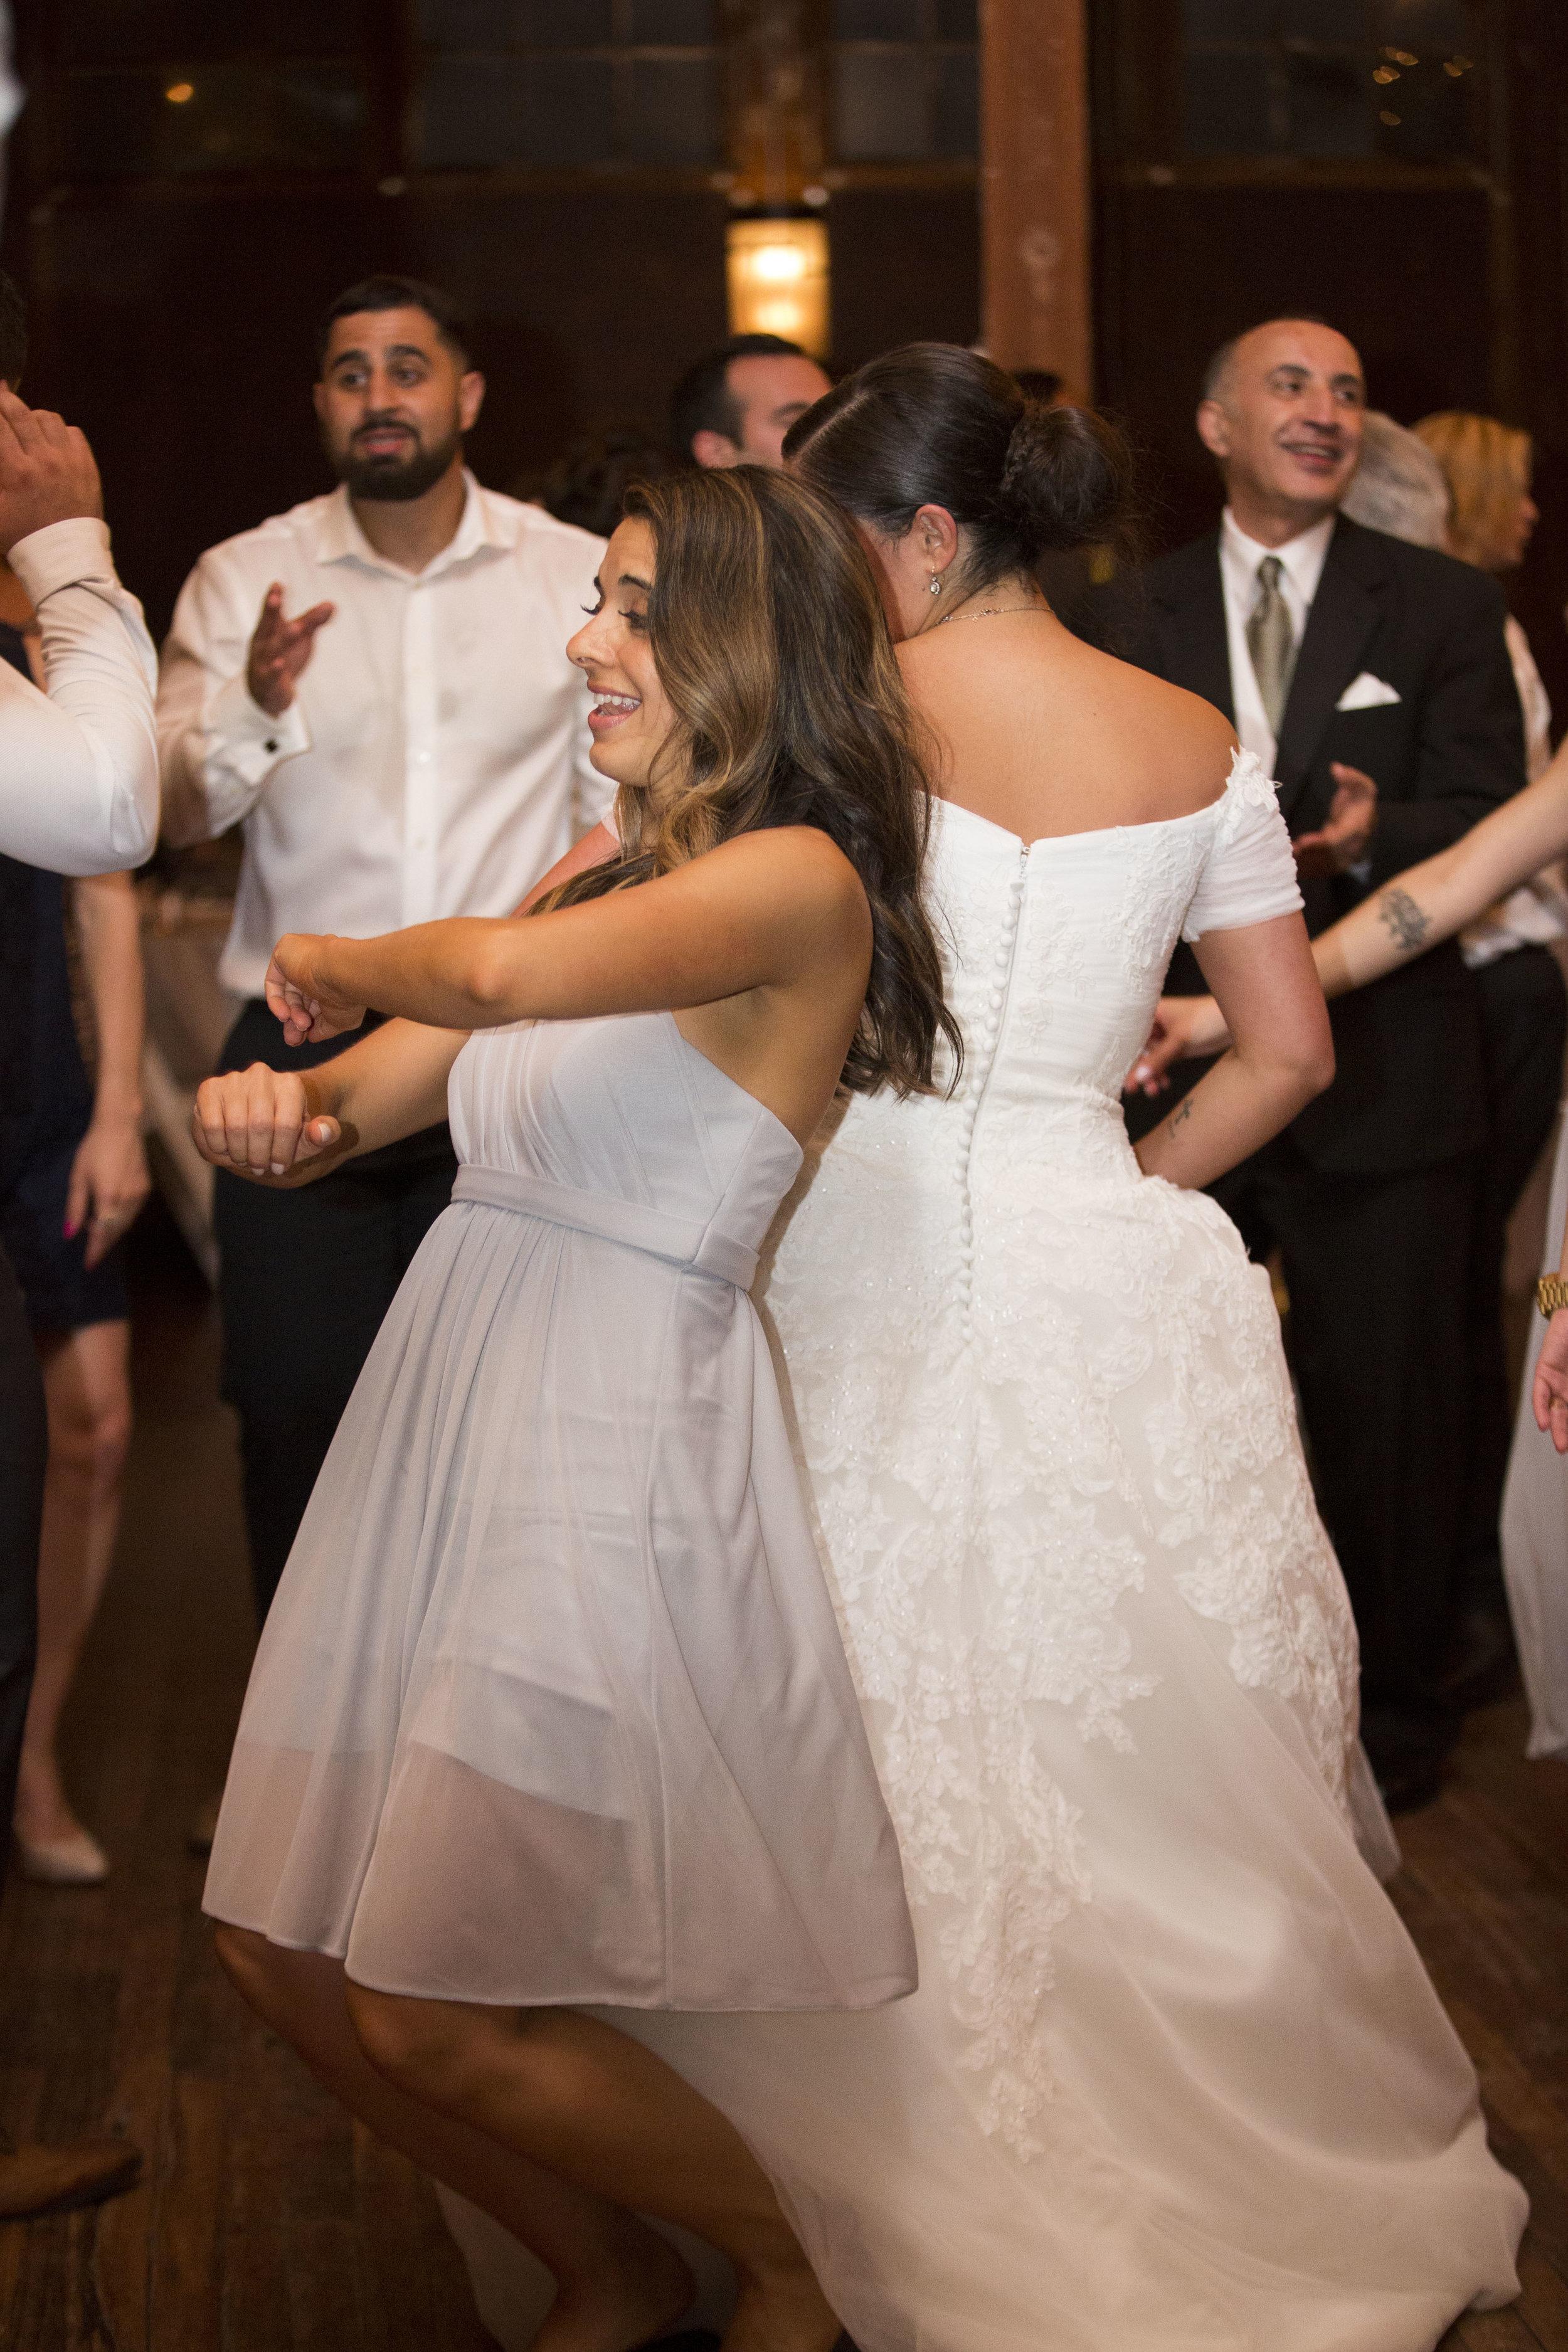 ATGI_Magali & Josh Wedding1_2S8A2496.jpg